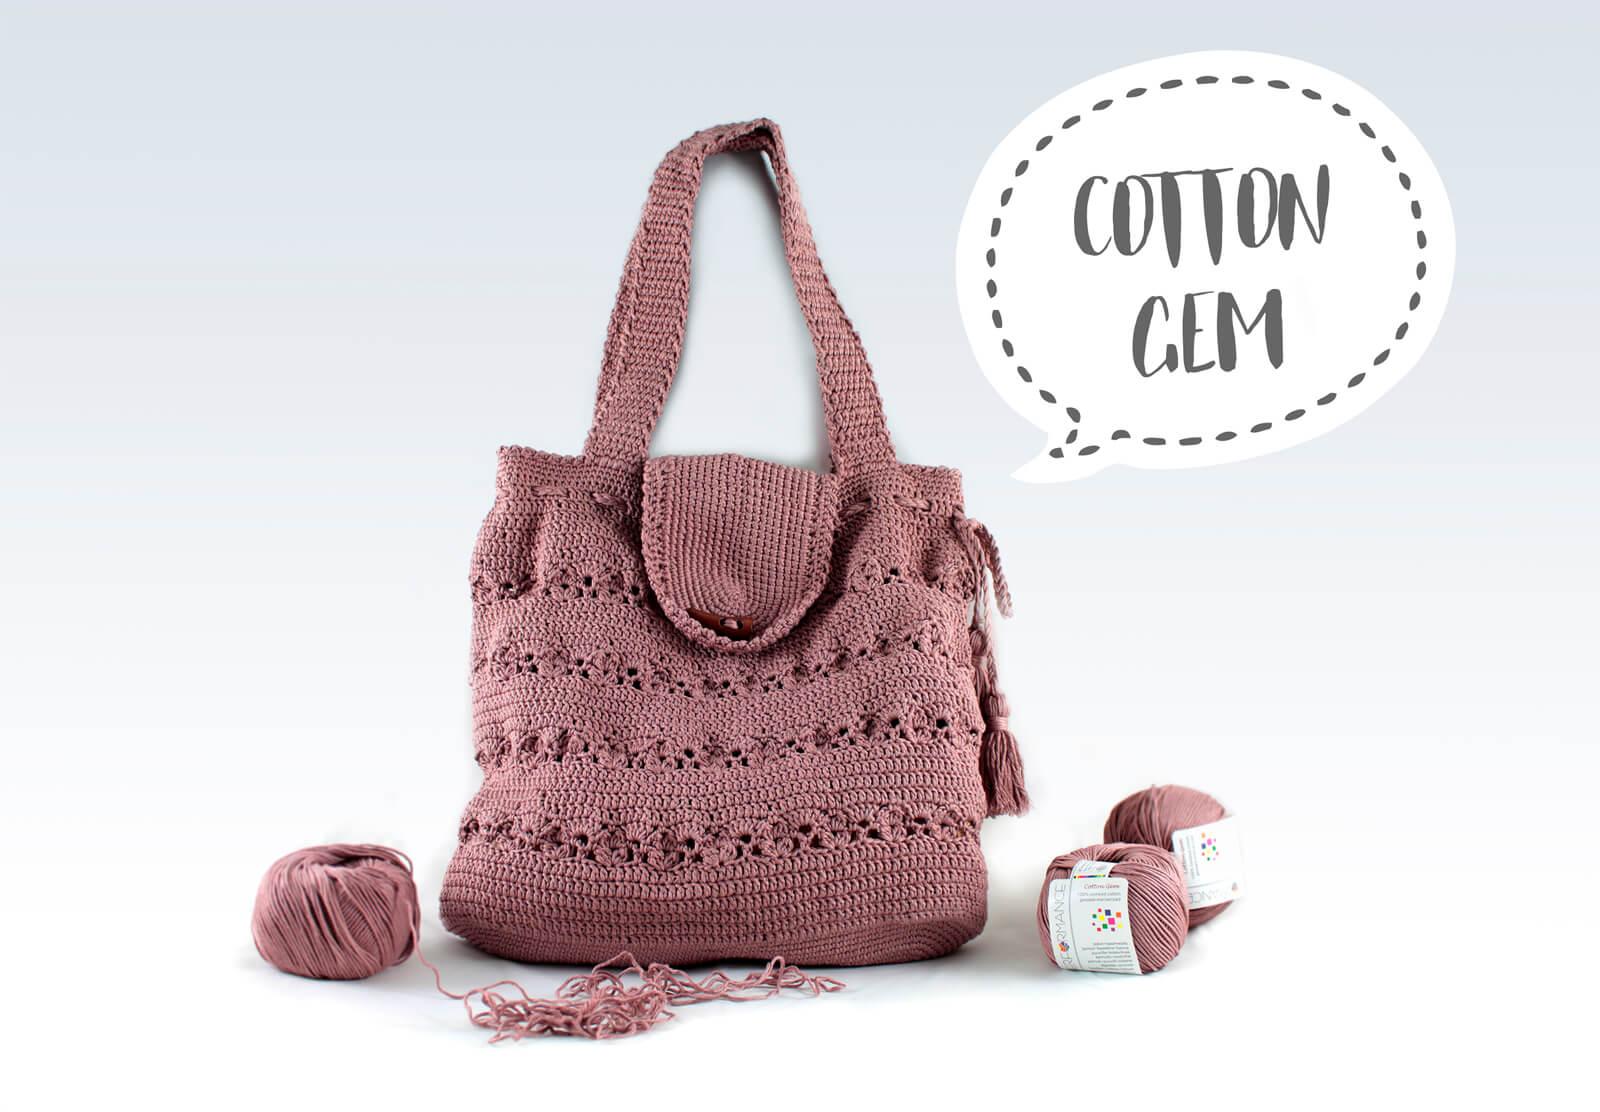 cottongem